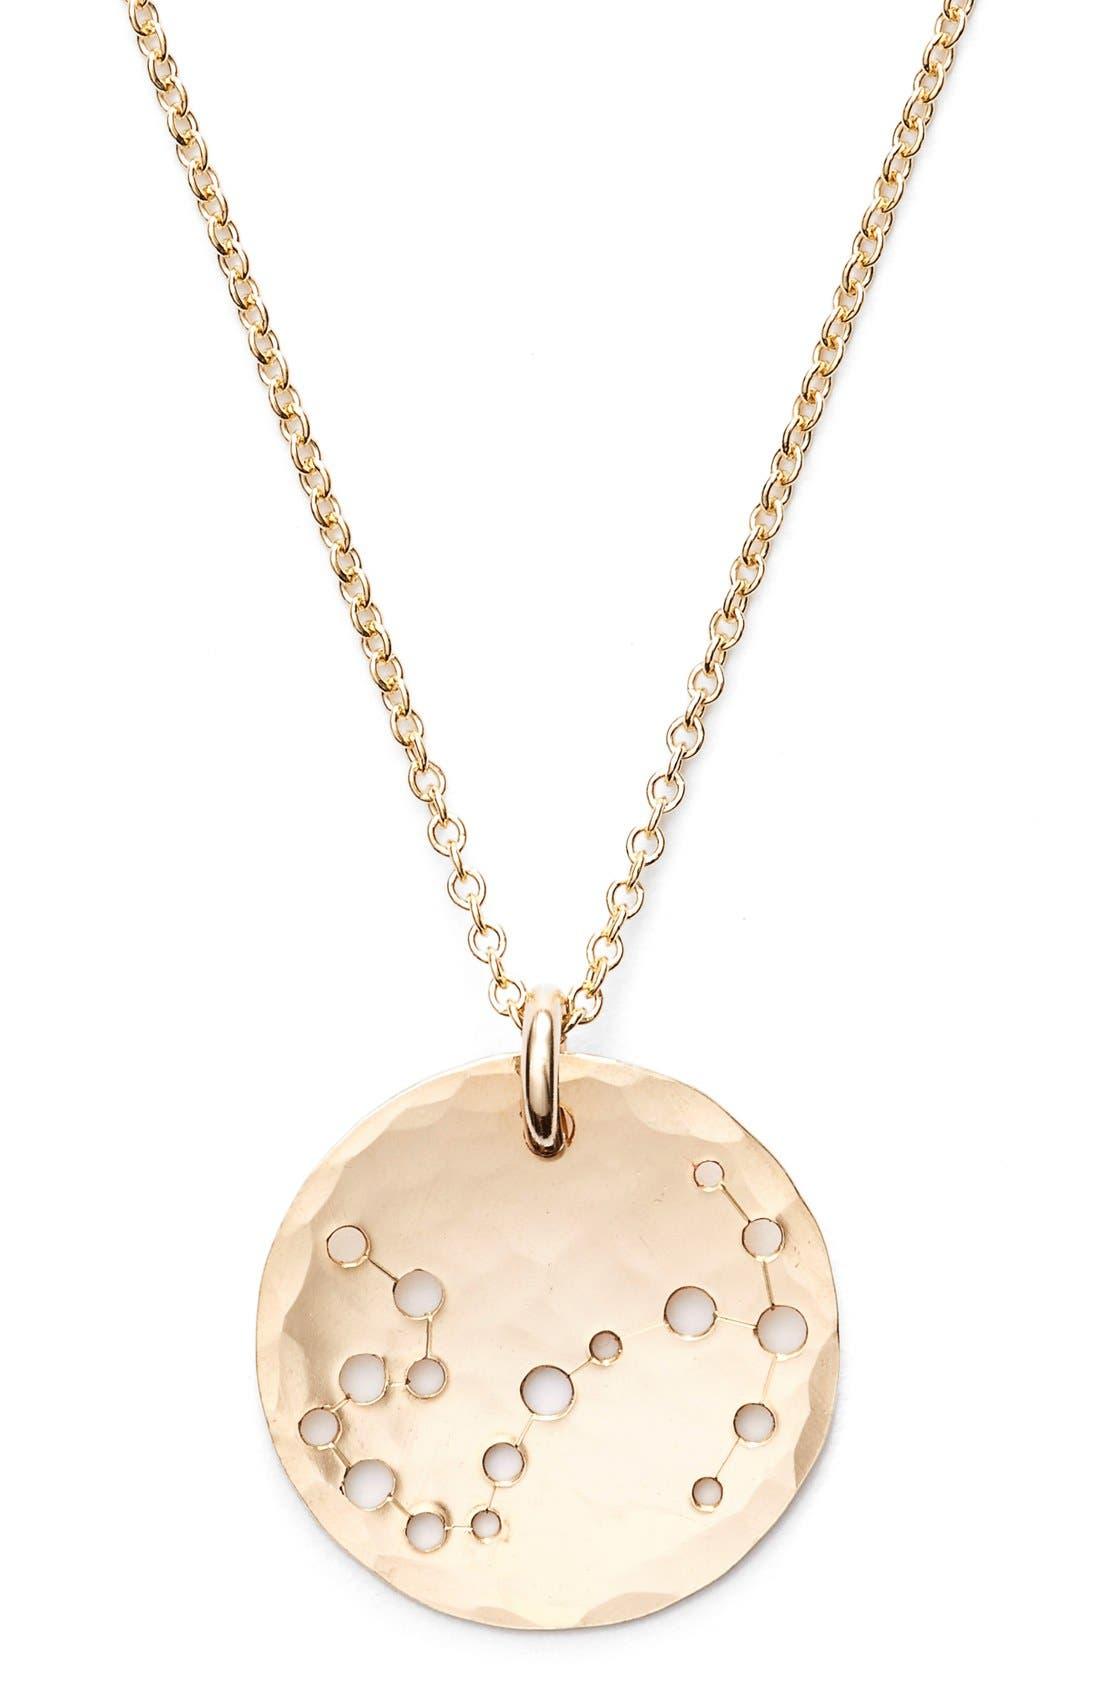 Ija 'Small Zodiac' 14k-Gold Fill Necklace,                             Alternate thumbnail 32, color,